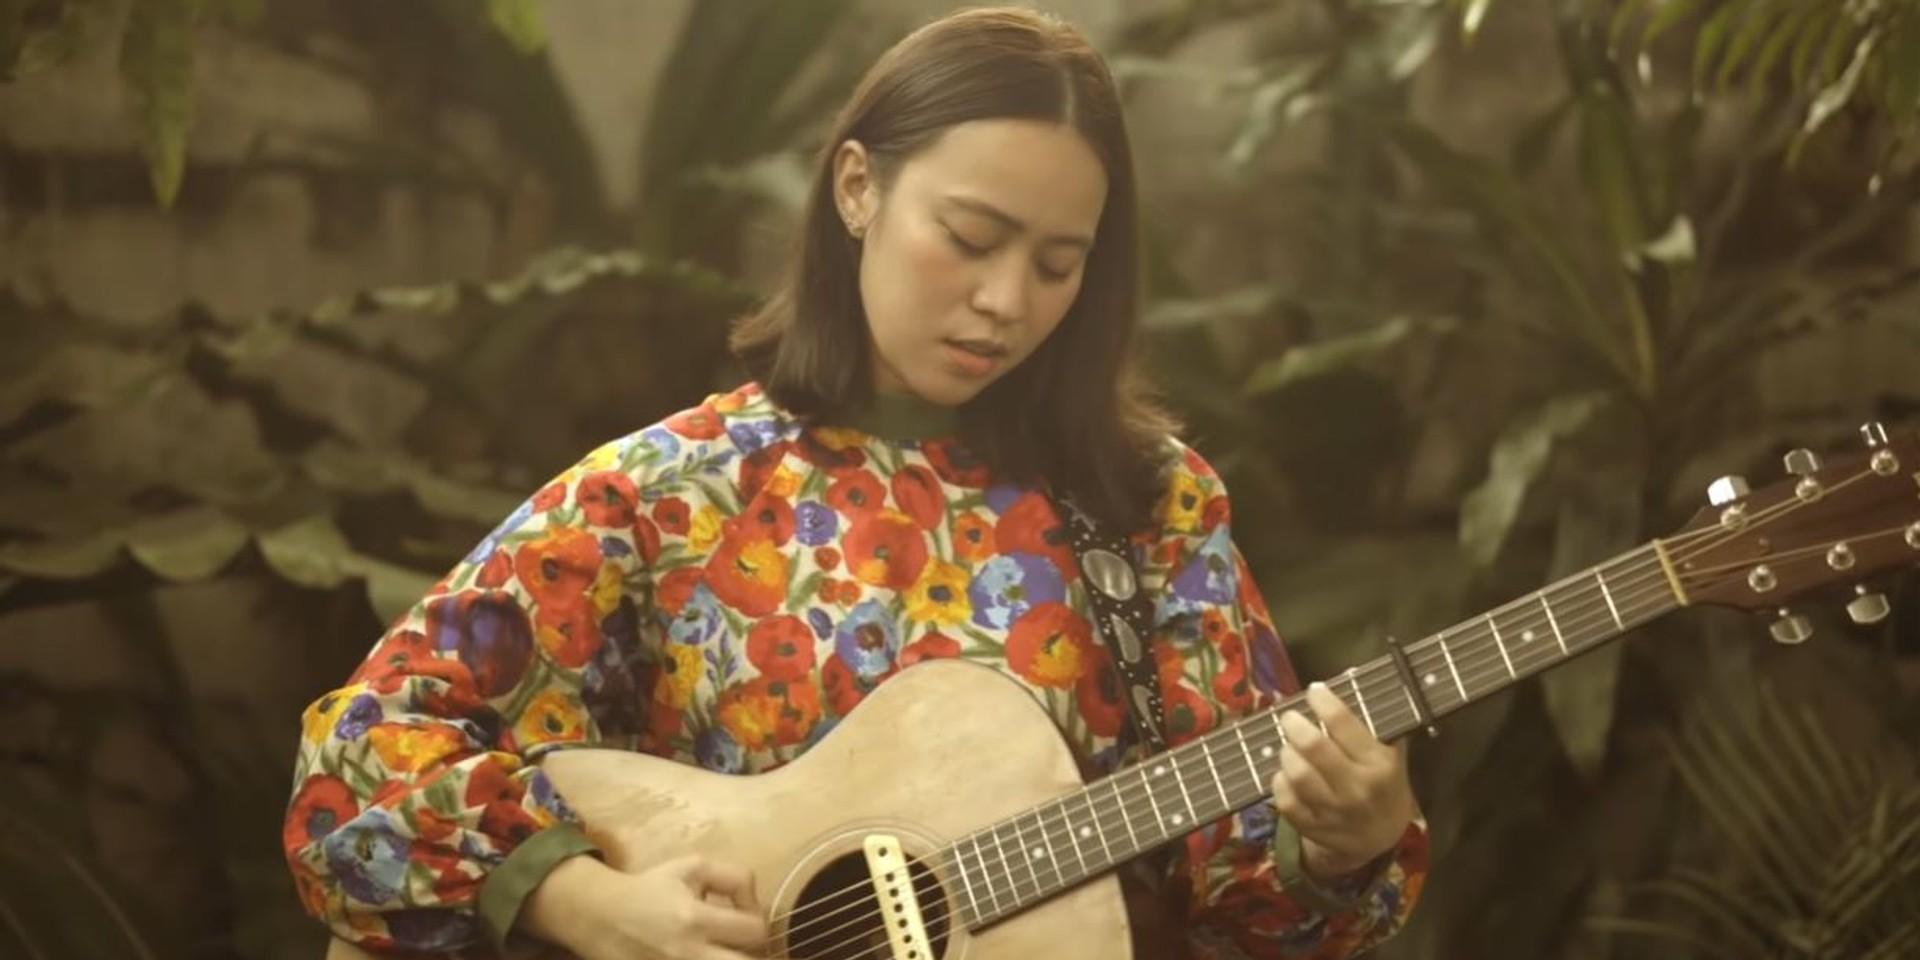 Reese Lansangan releases vulnerable new single 'Tenderfoot' – watch